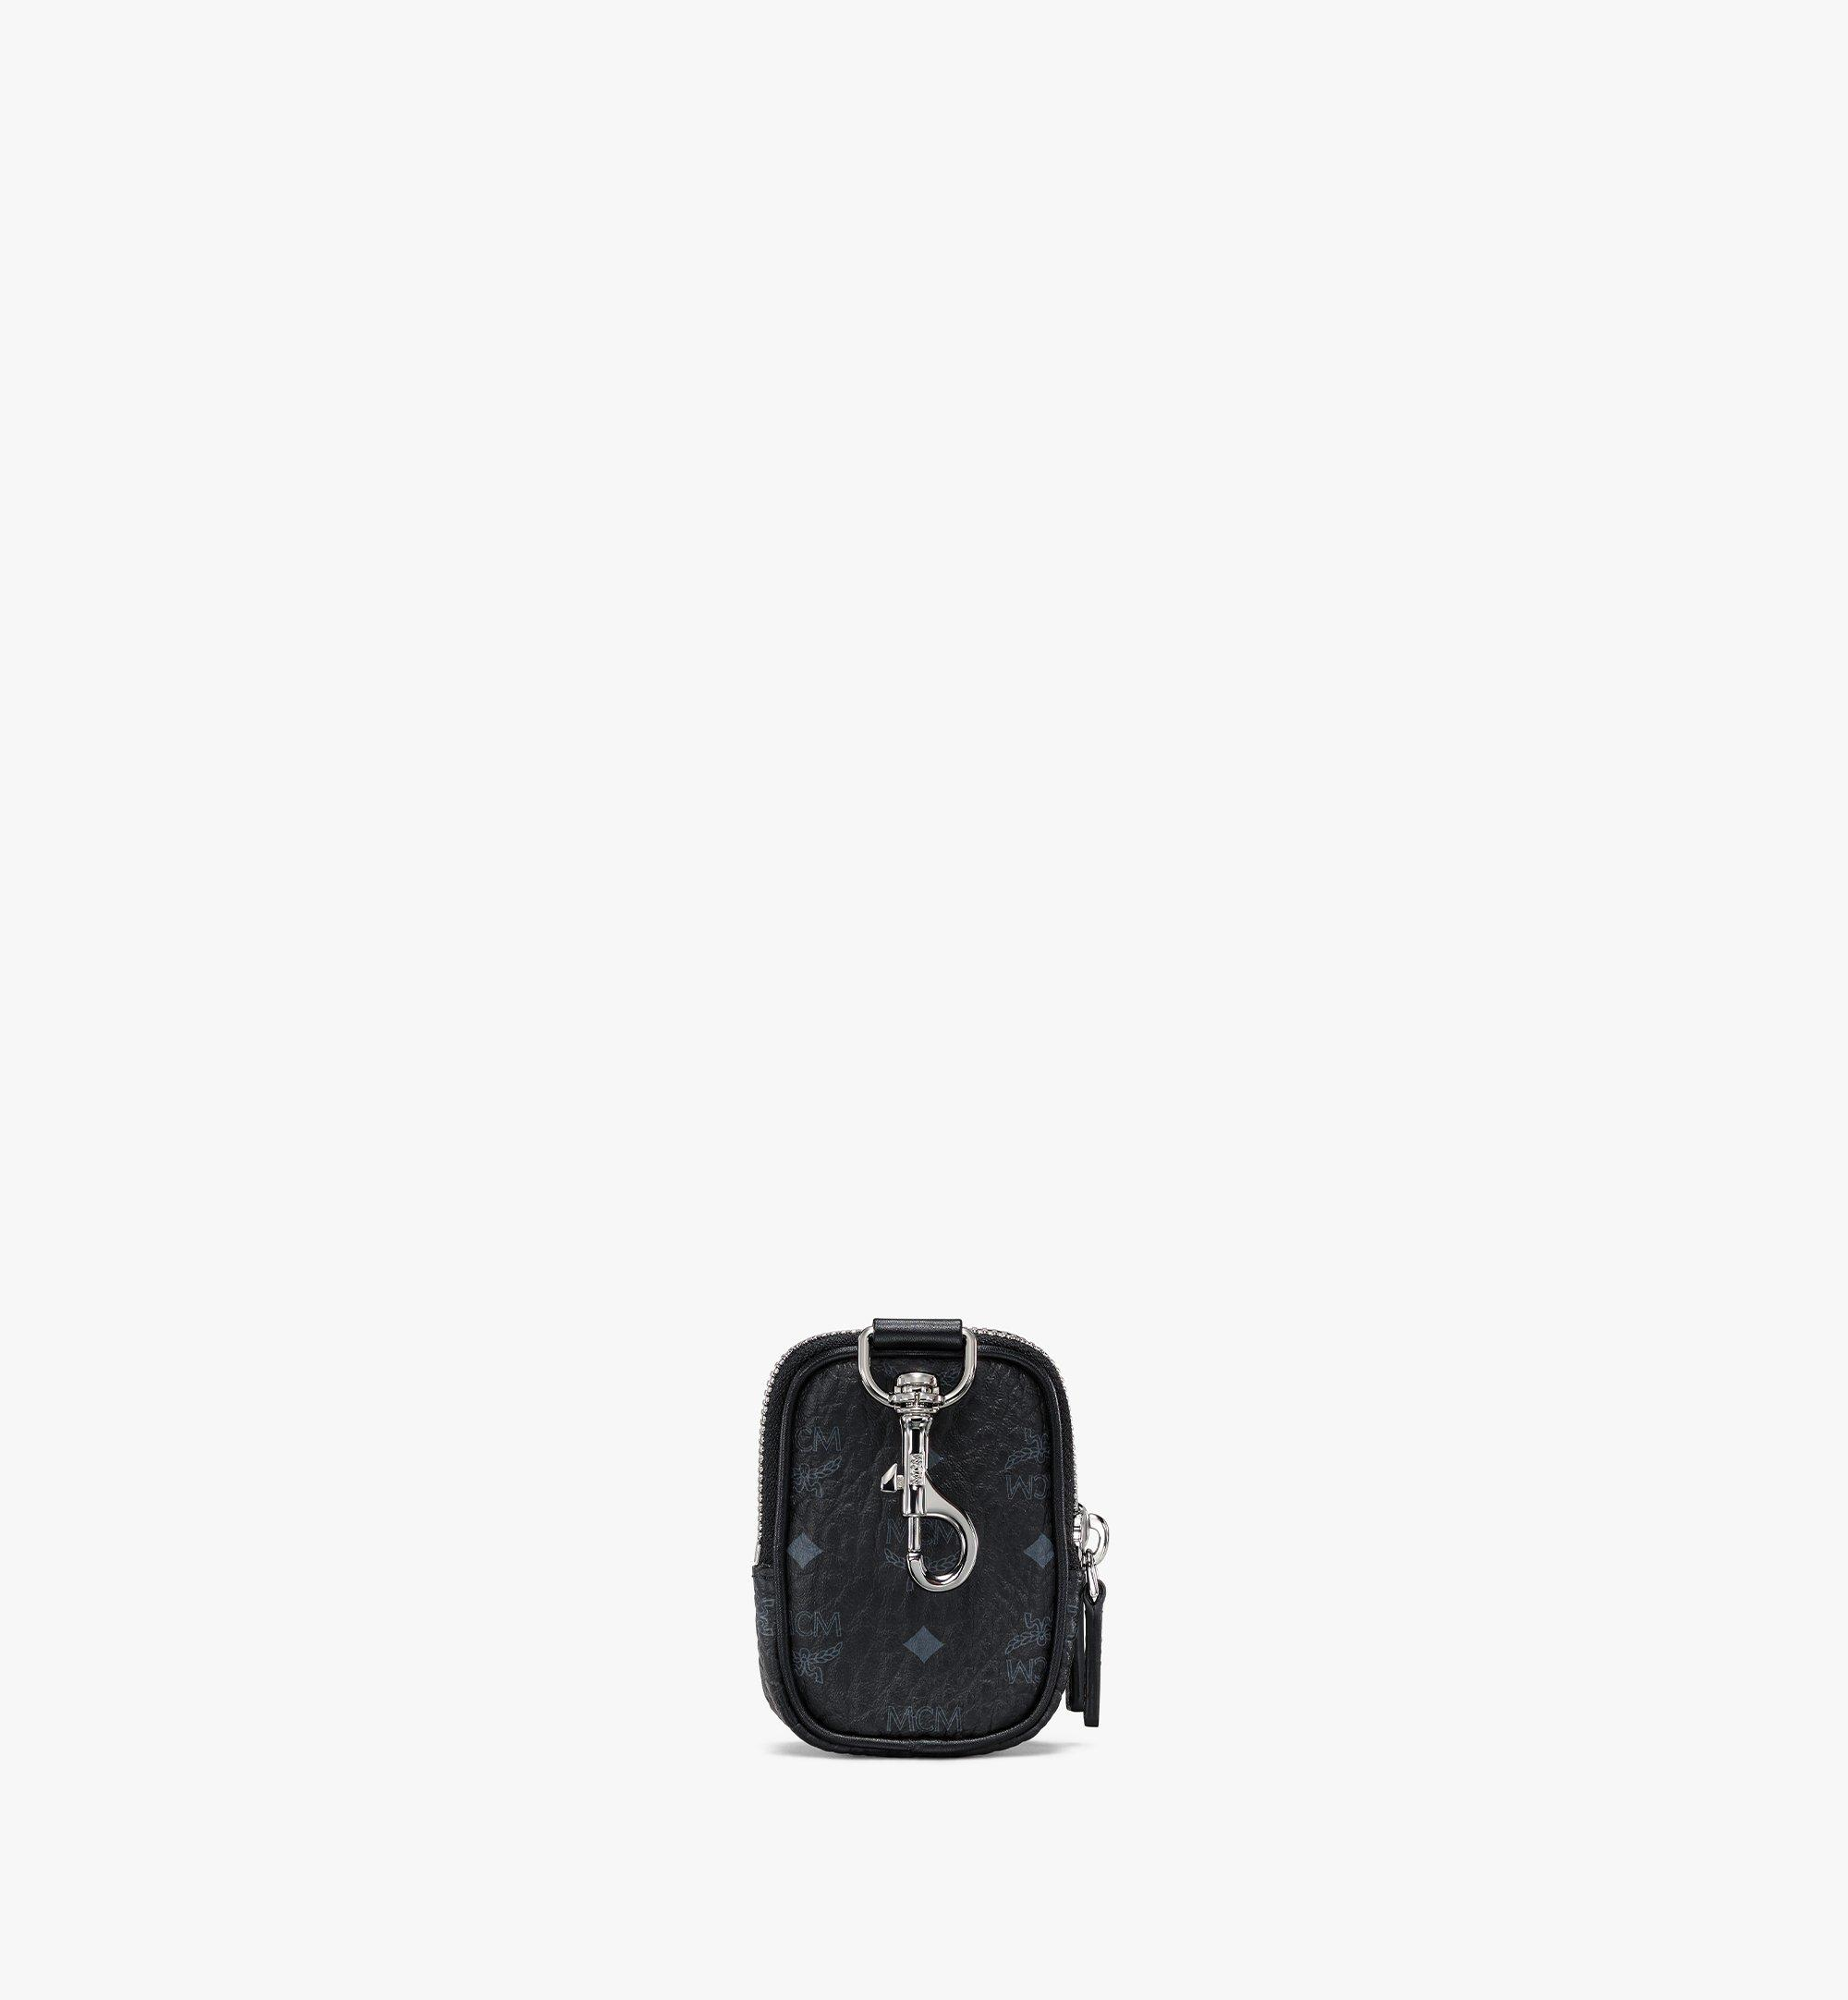 MCM Pouch Charm w/ Pocket in Visetos Original Black MXZBSVI07BK001 Alternate View 3